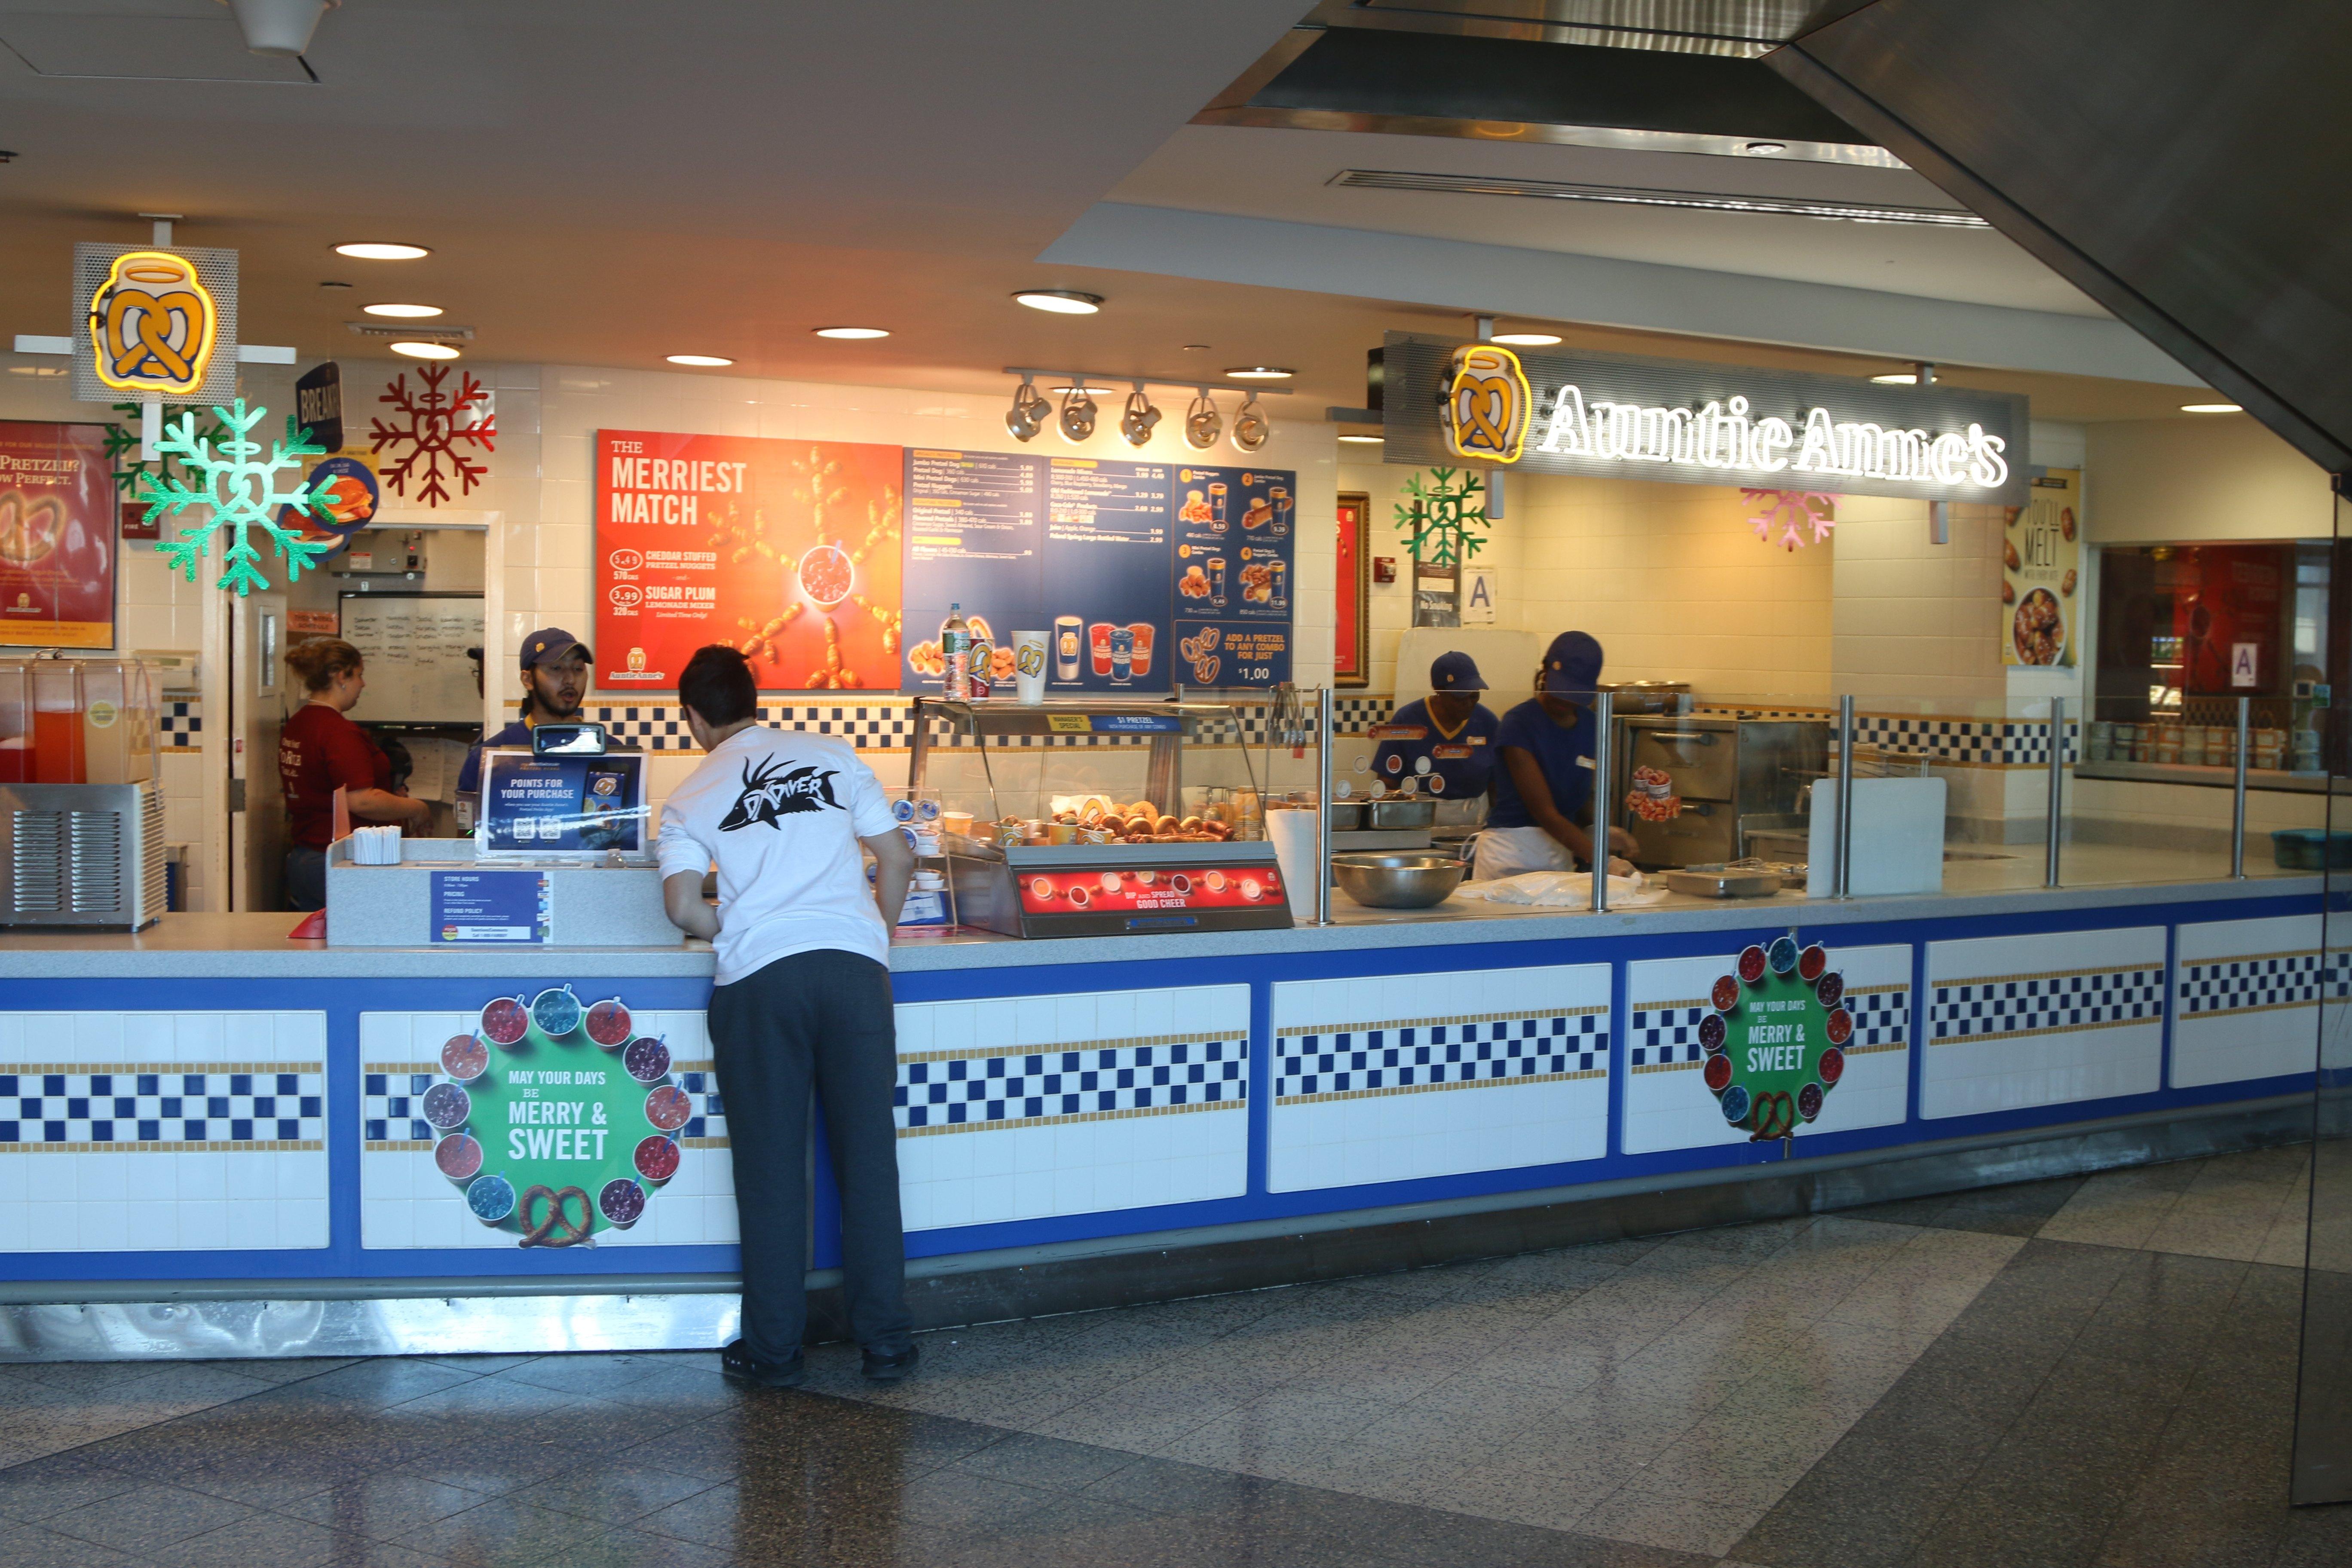 Food Court Inside Of LaGuardia Airport